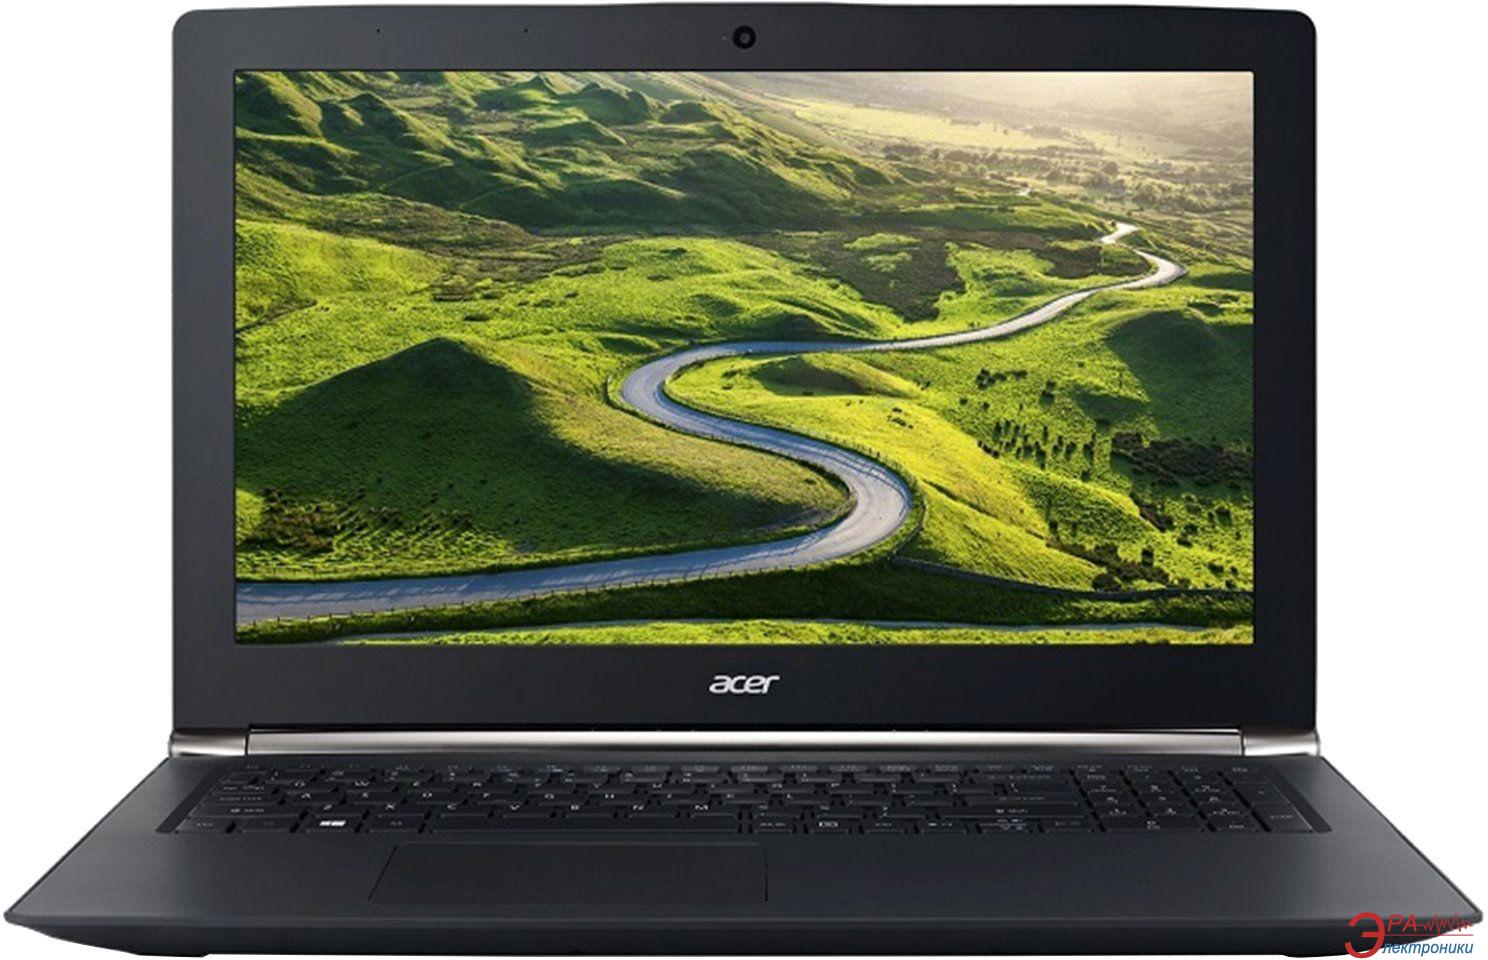 Ноутбук Acer Aspire Nitro VN7-572G-52PN (NX.G6GEU.003) Black 15,6